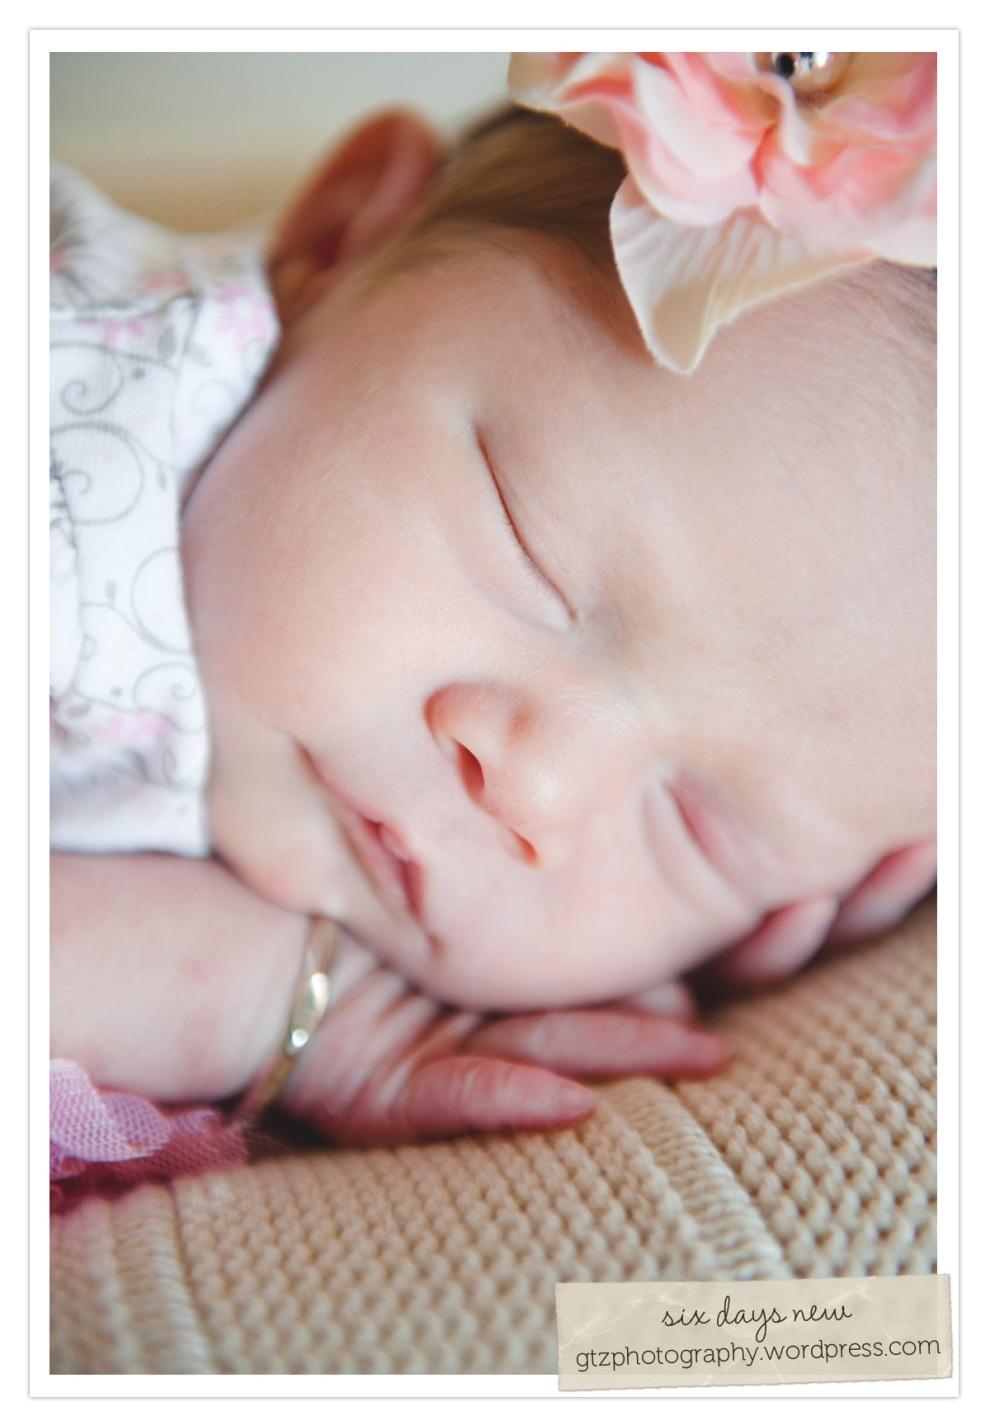 six day old newborn baby girl sleeping